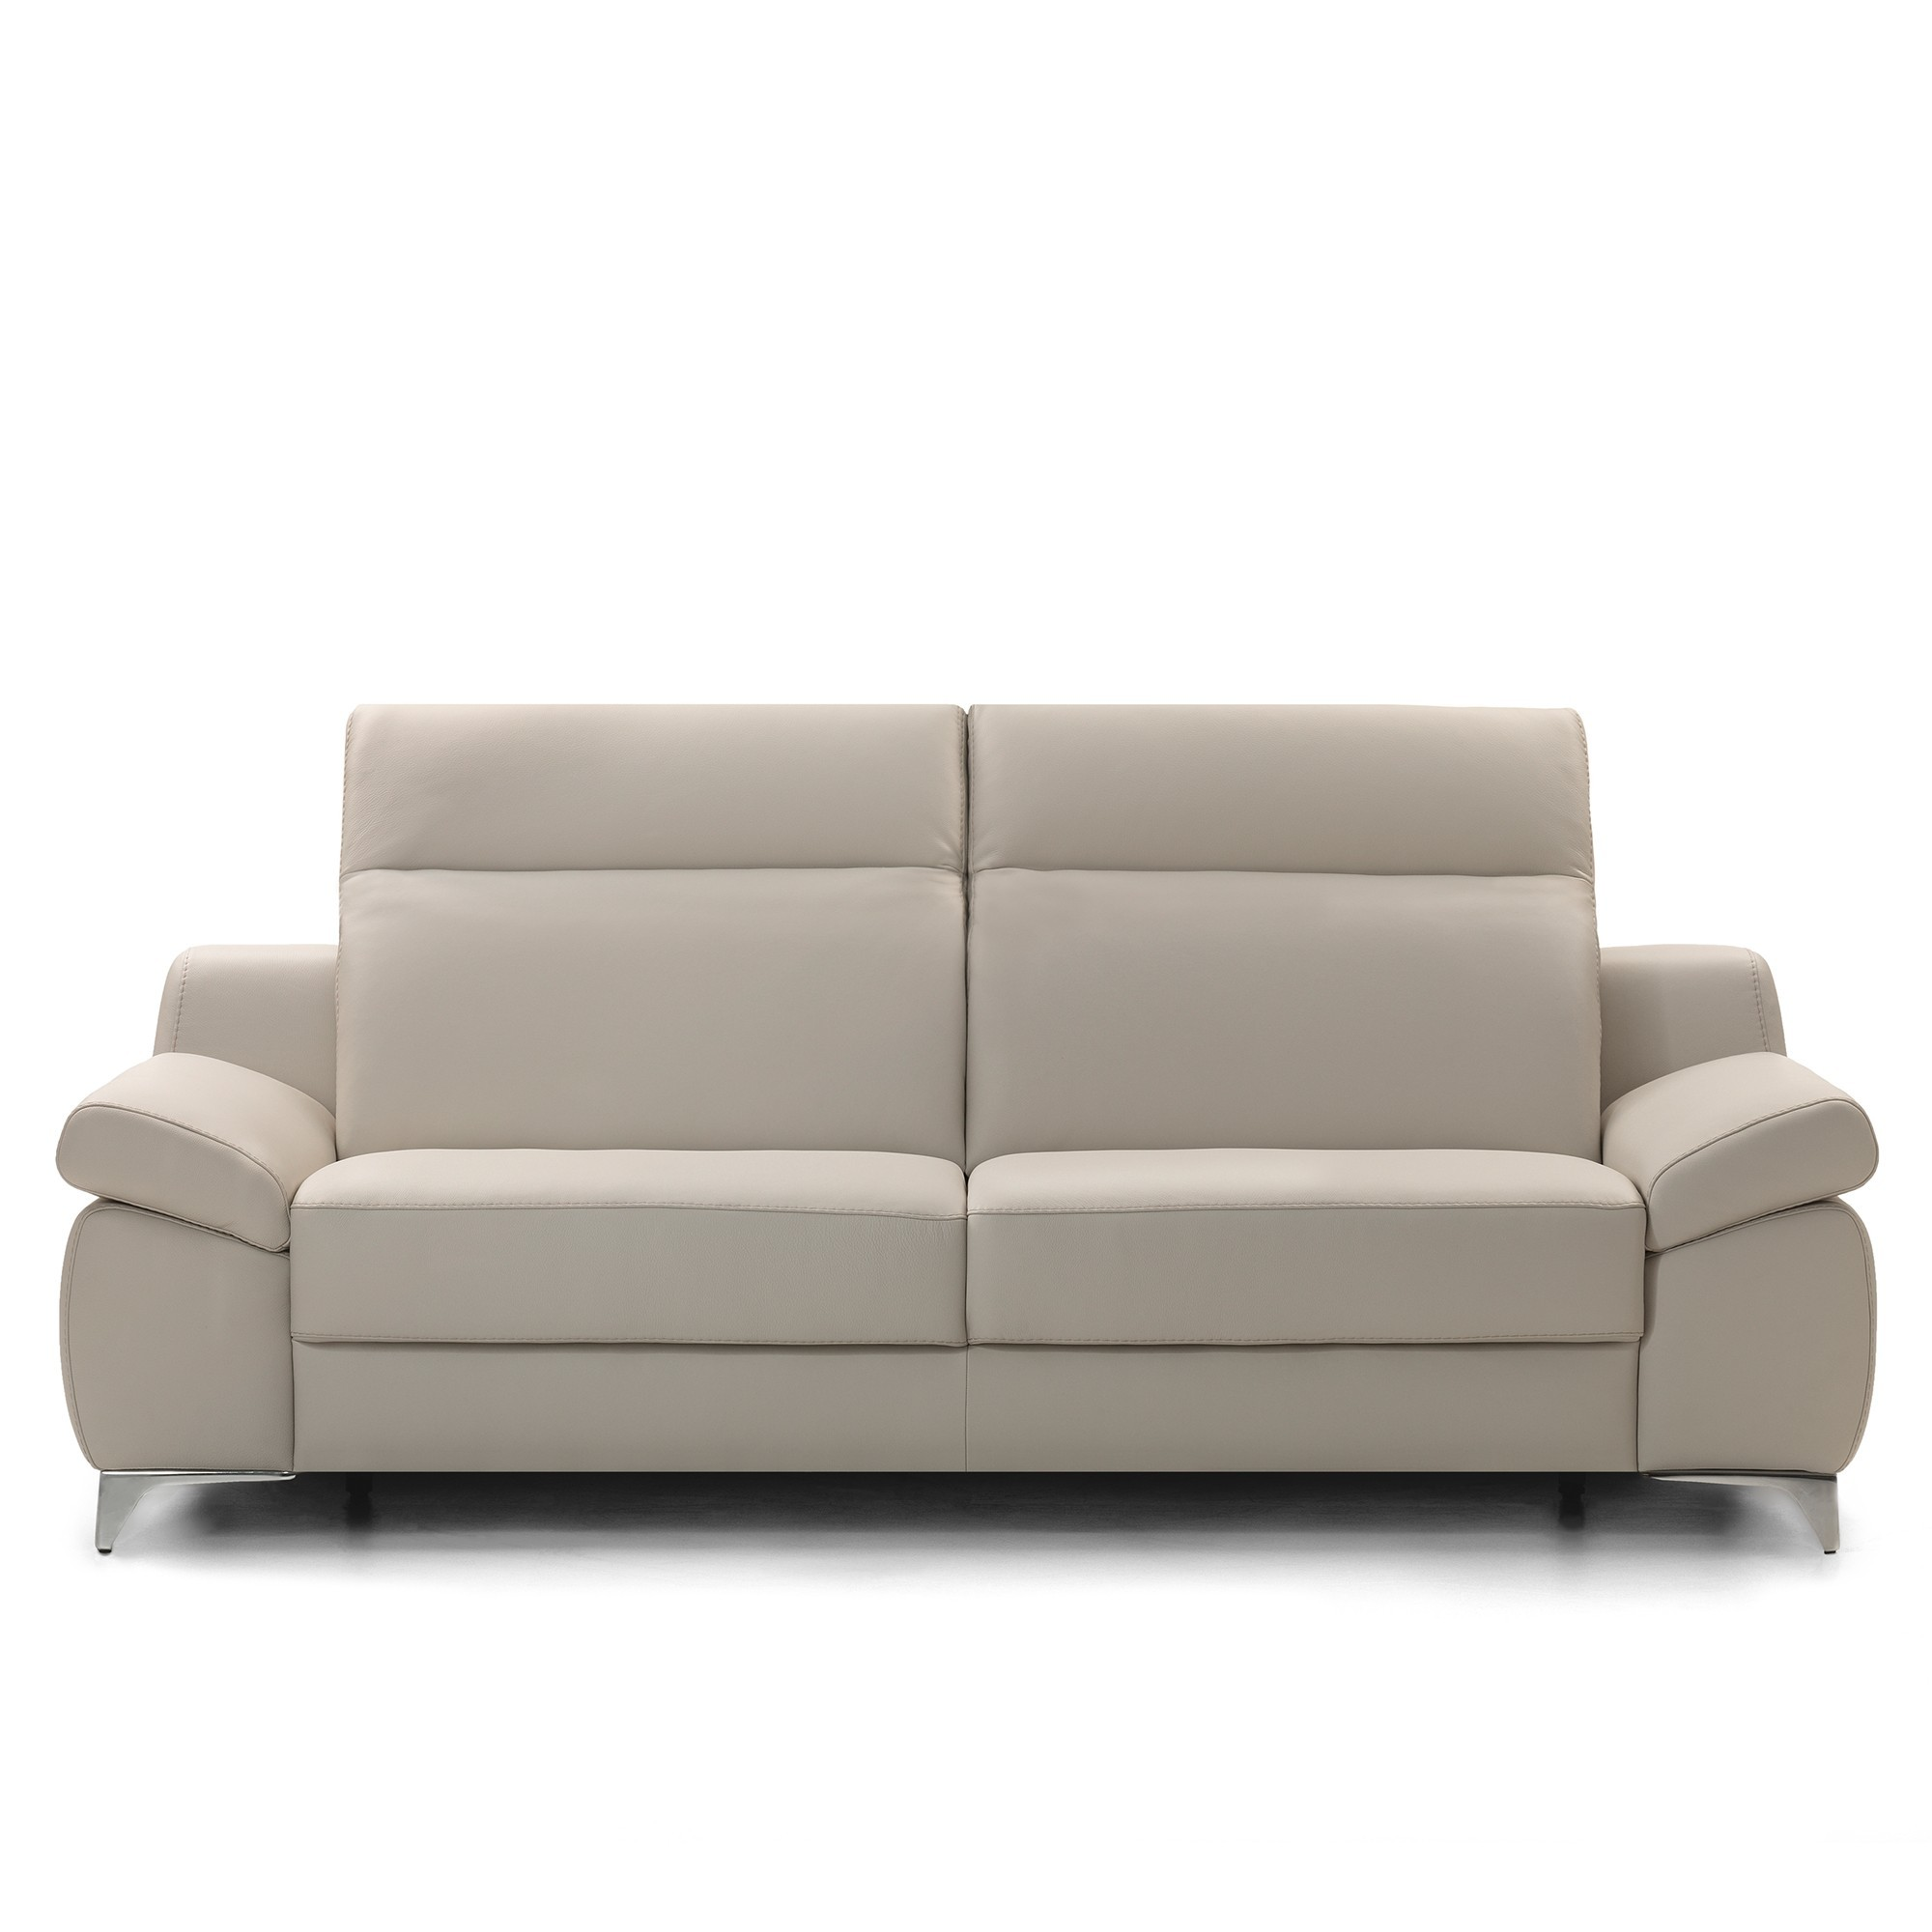 Rom Wren Large Sofa All Sofas Cookes Furniture